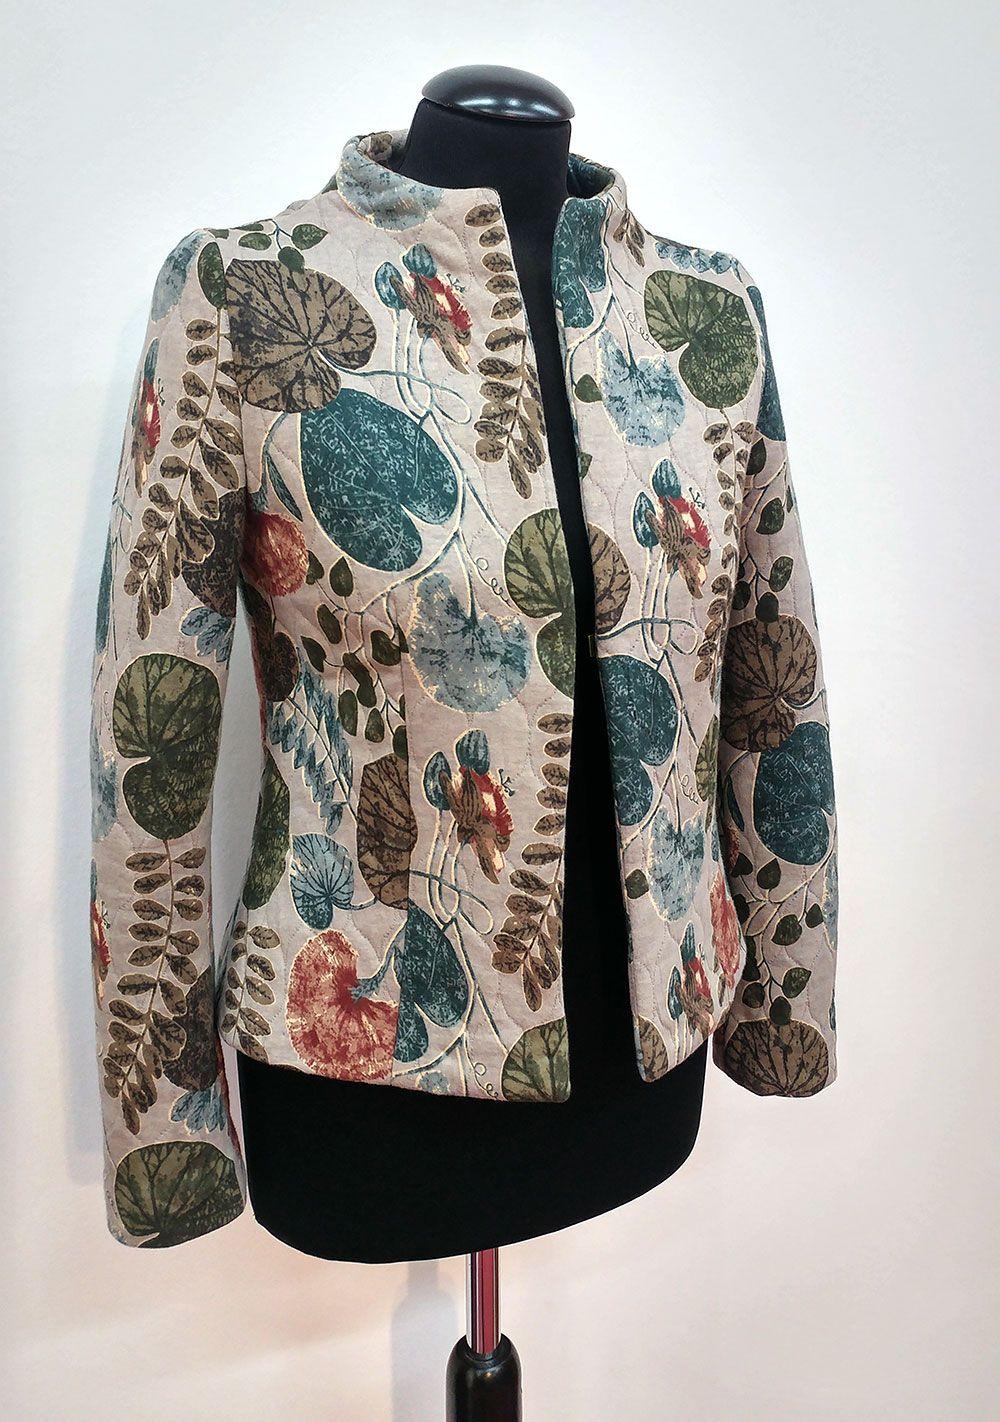 Schnittquelle Schnittmuster Shop - Schnittmuster Jacke